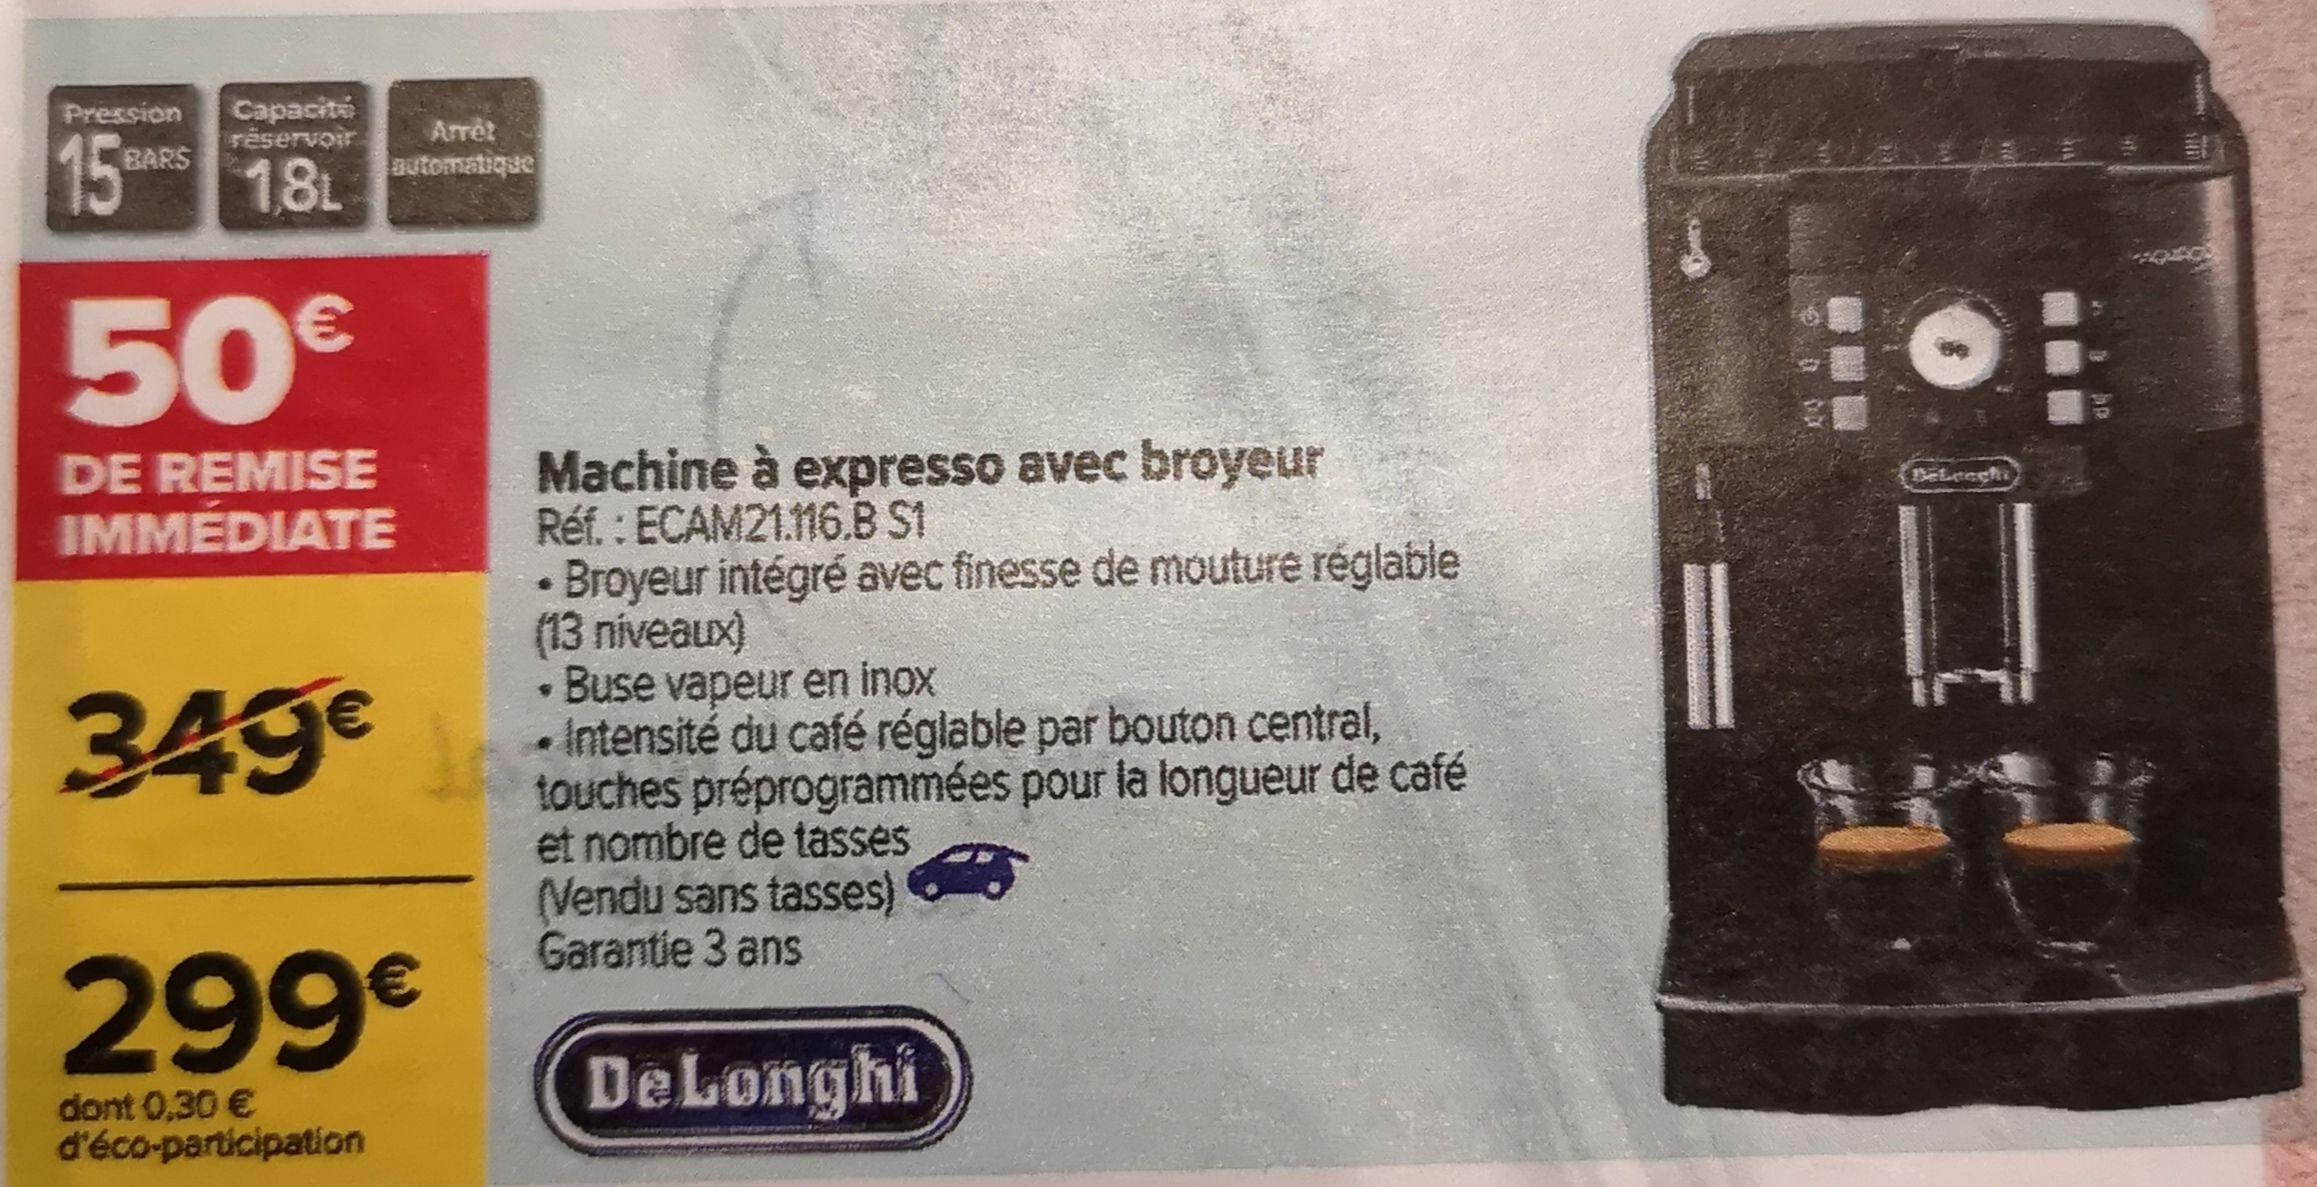 Machine expresso avec broyeur De'Longhi Magnifica S ECAM 21.116.B S1